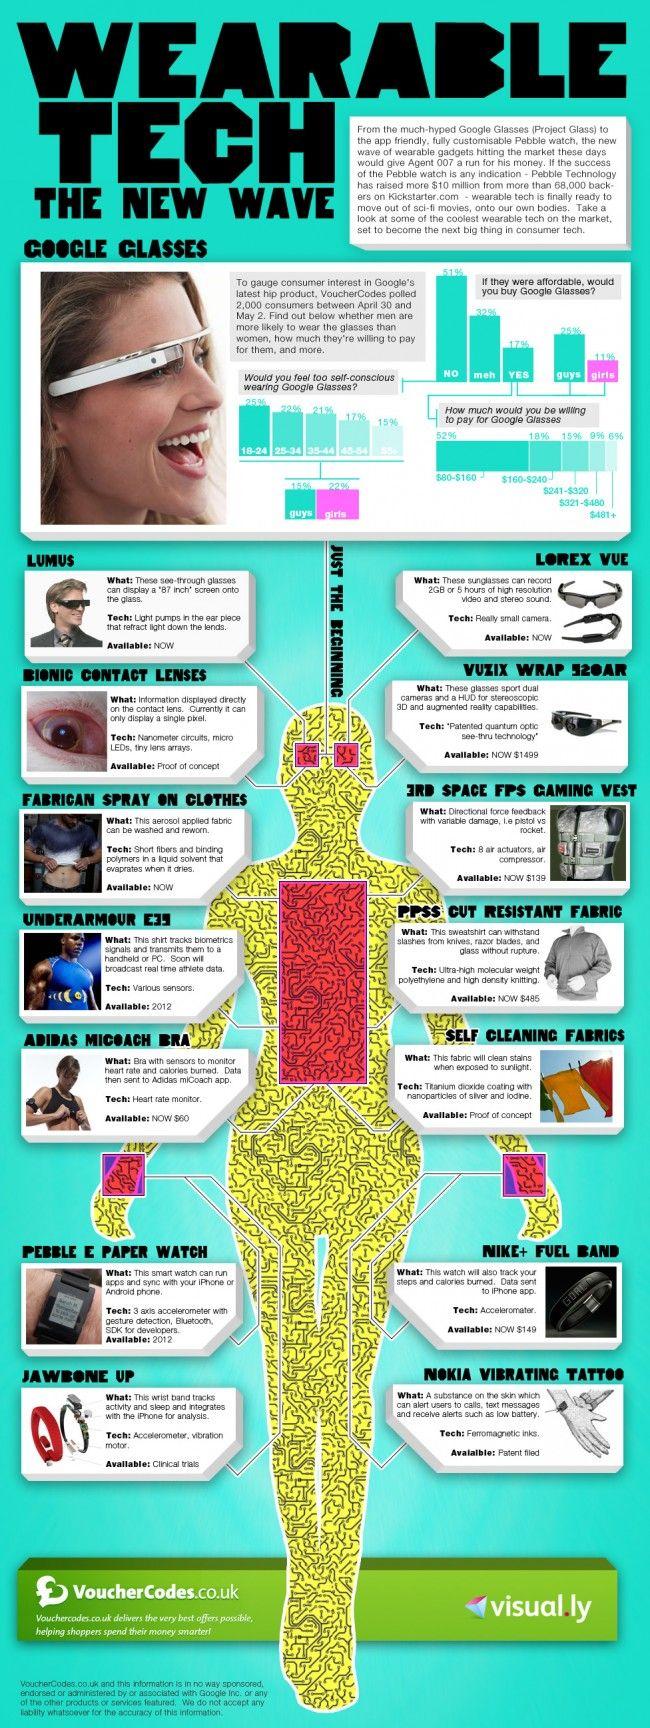 Wearable Tech: Geek Gear Steps It Up A Notch [Infographic]